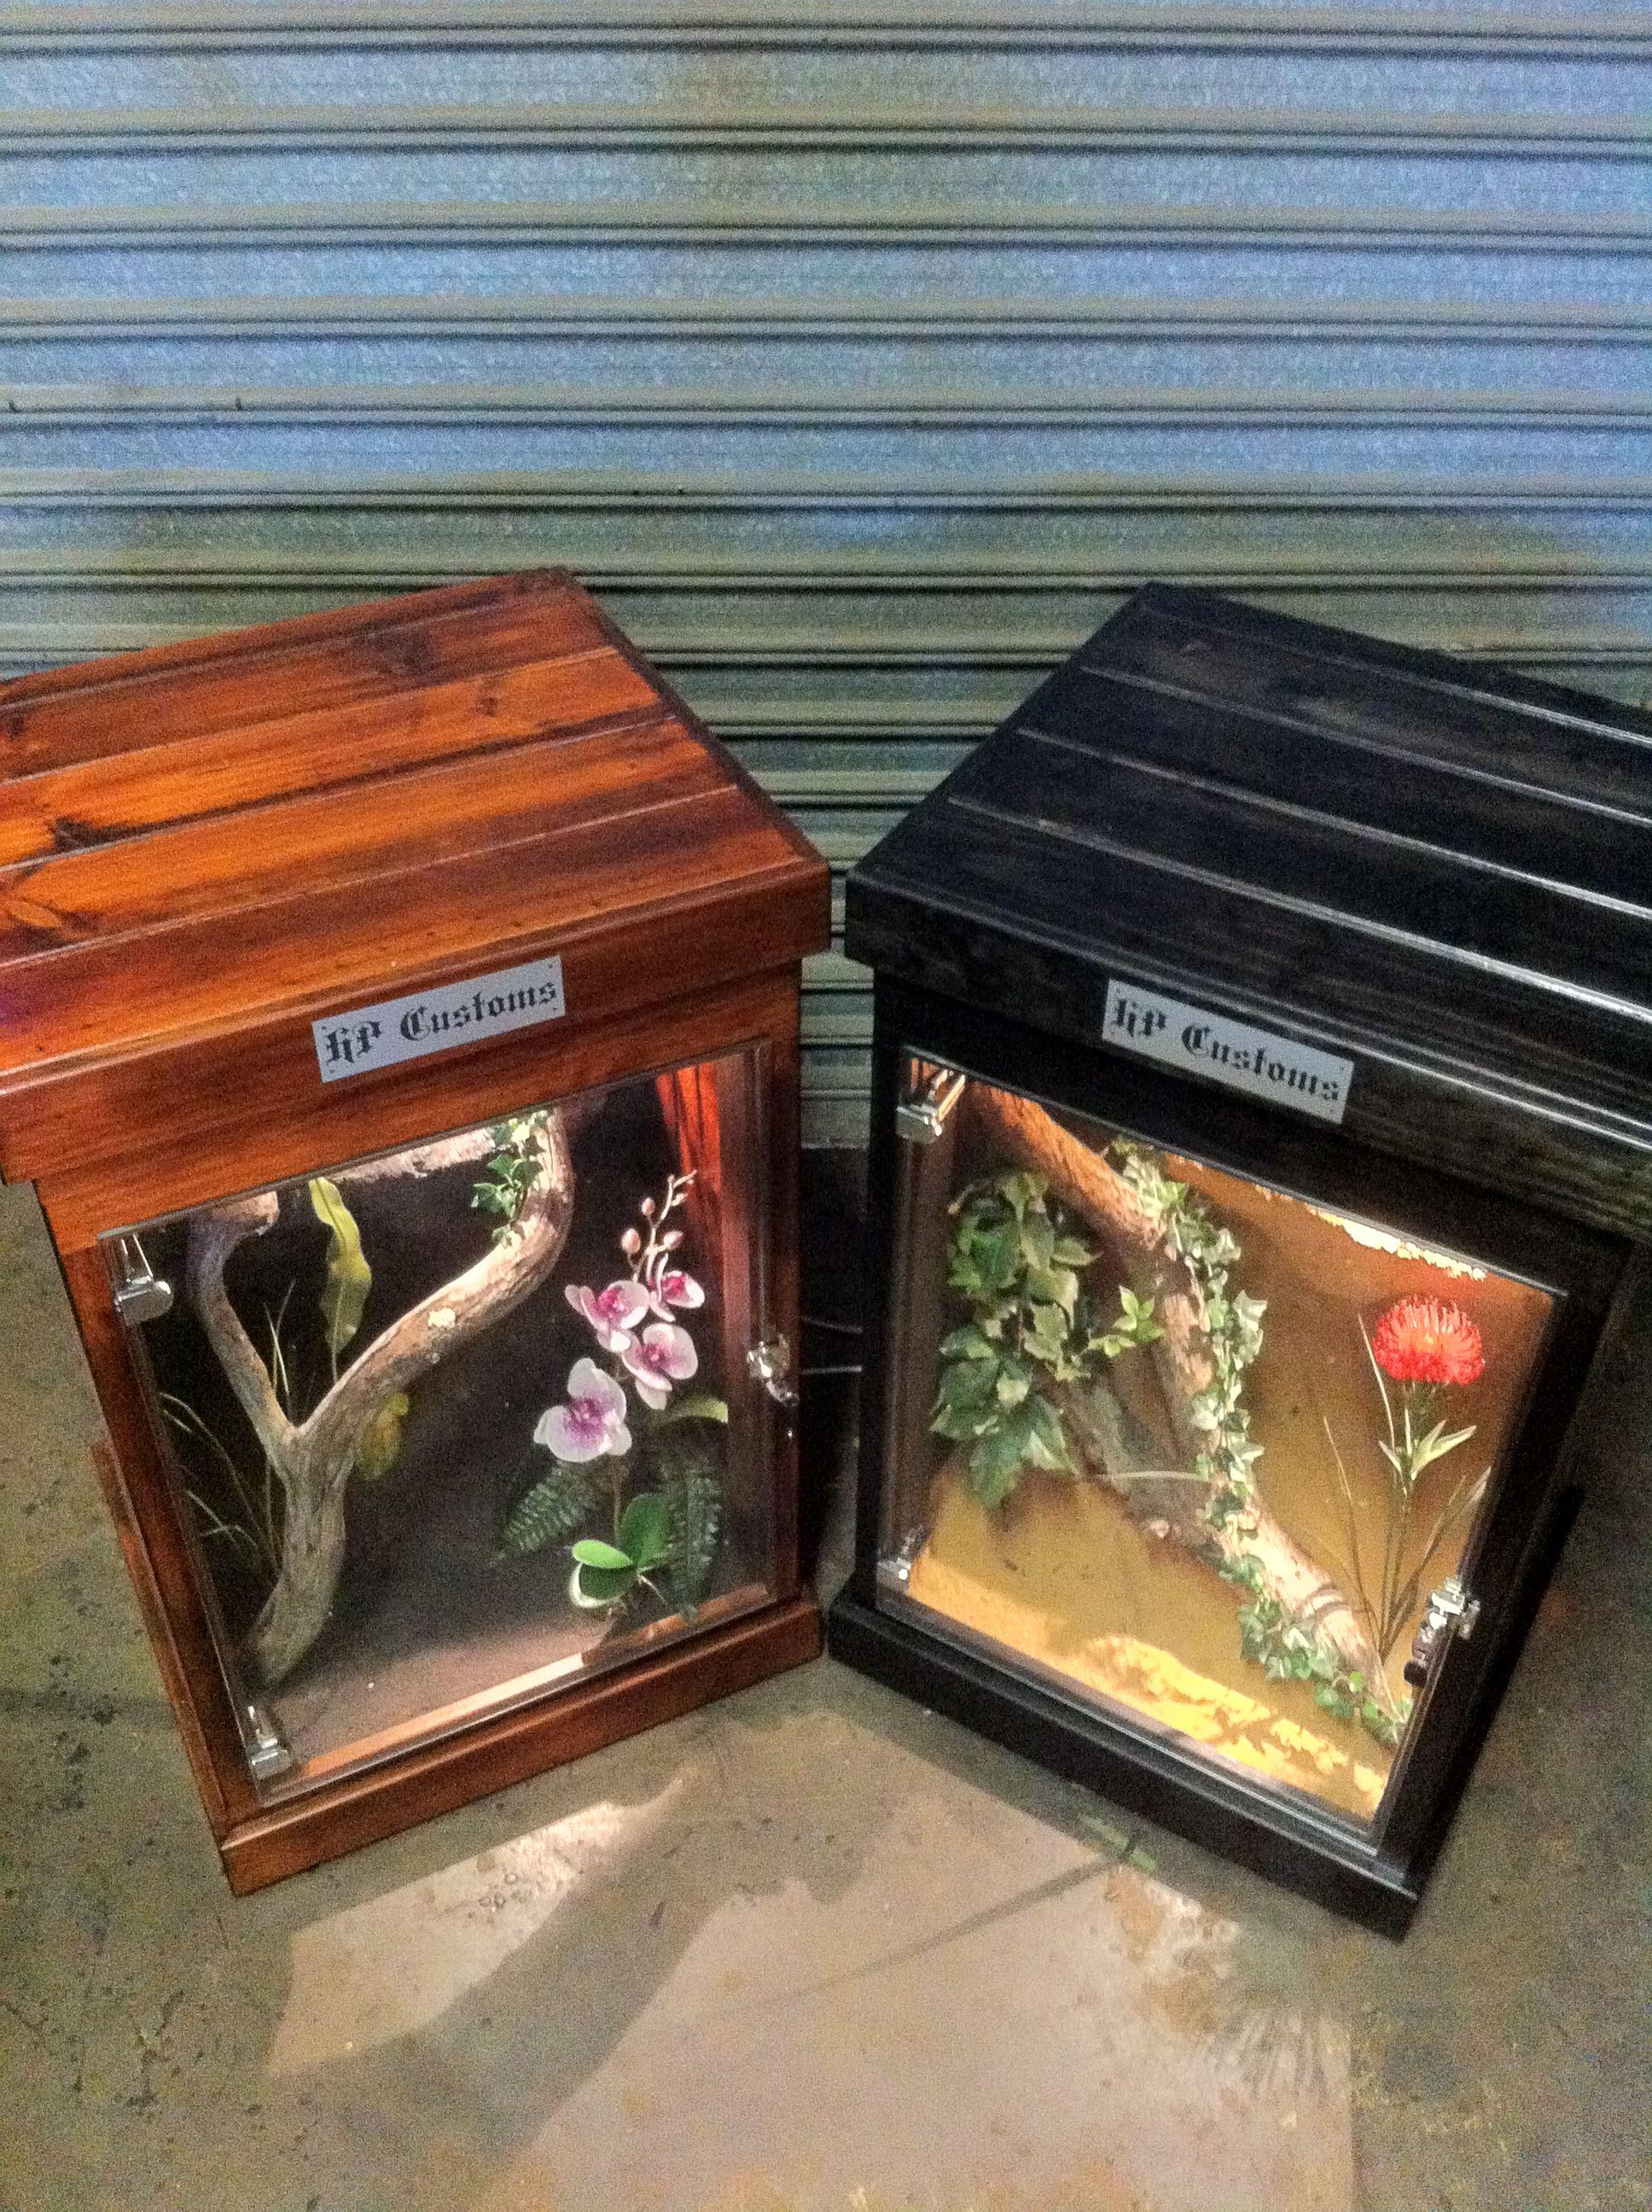 Https Www Facebook Com Pages Hp Customs Custom Reptile Enclosures 572704122760765 Reptile Enclosure Reptile Cage Reptile Terrarium